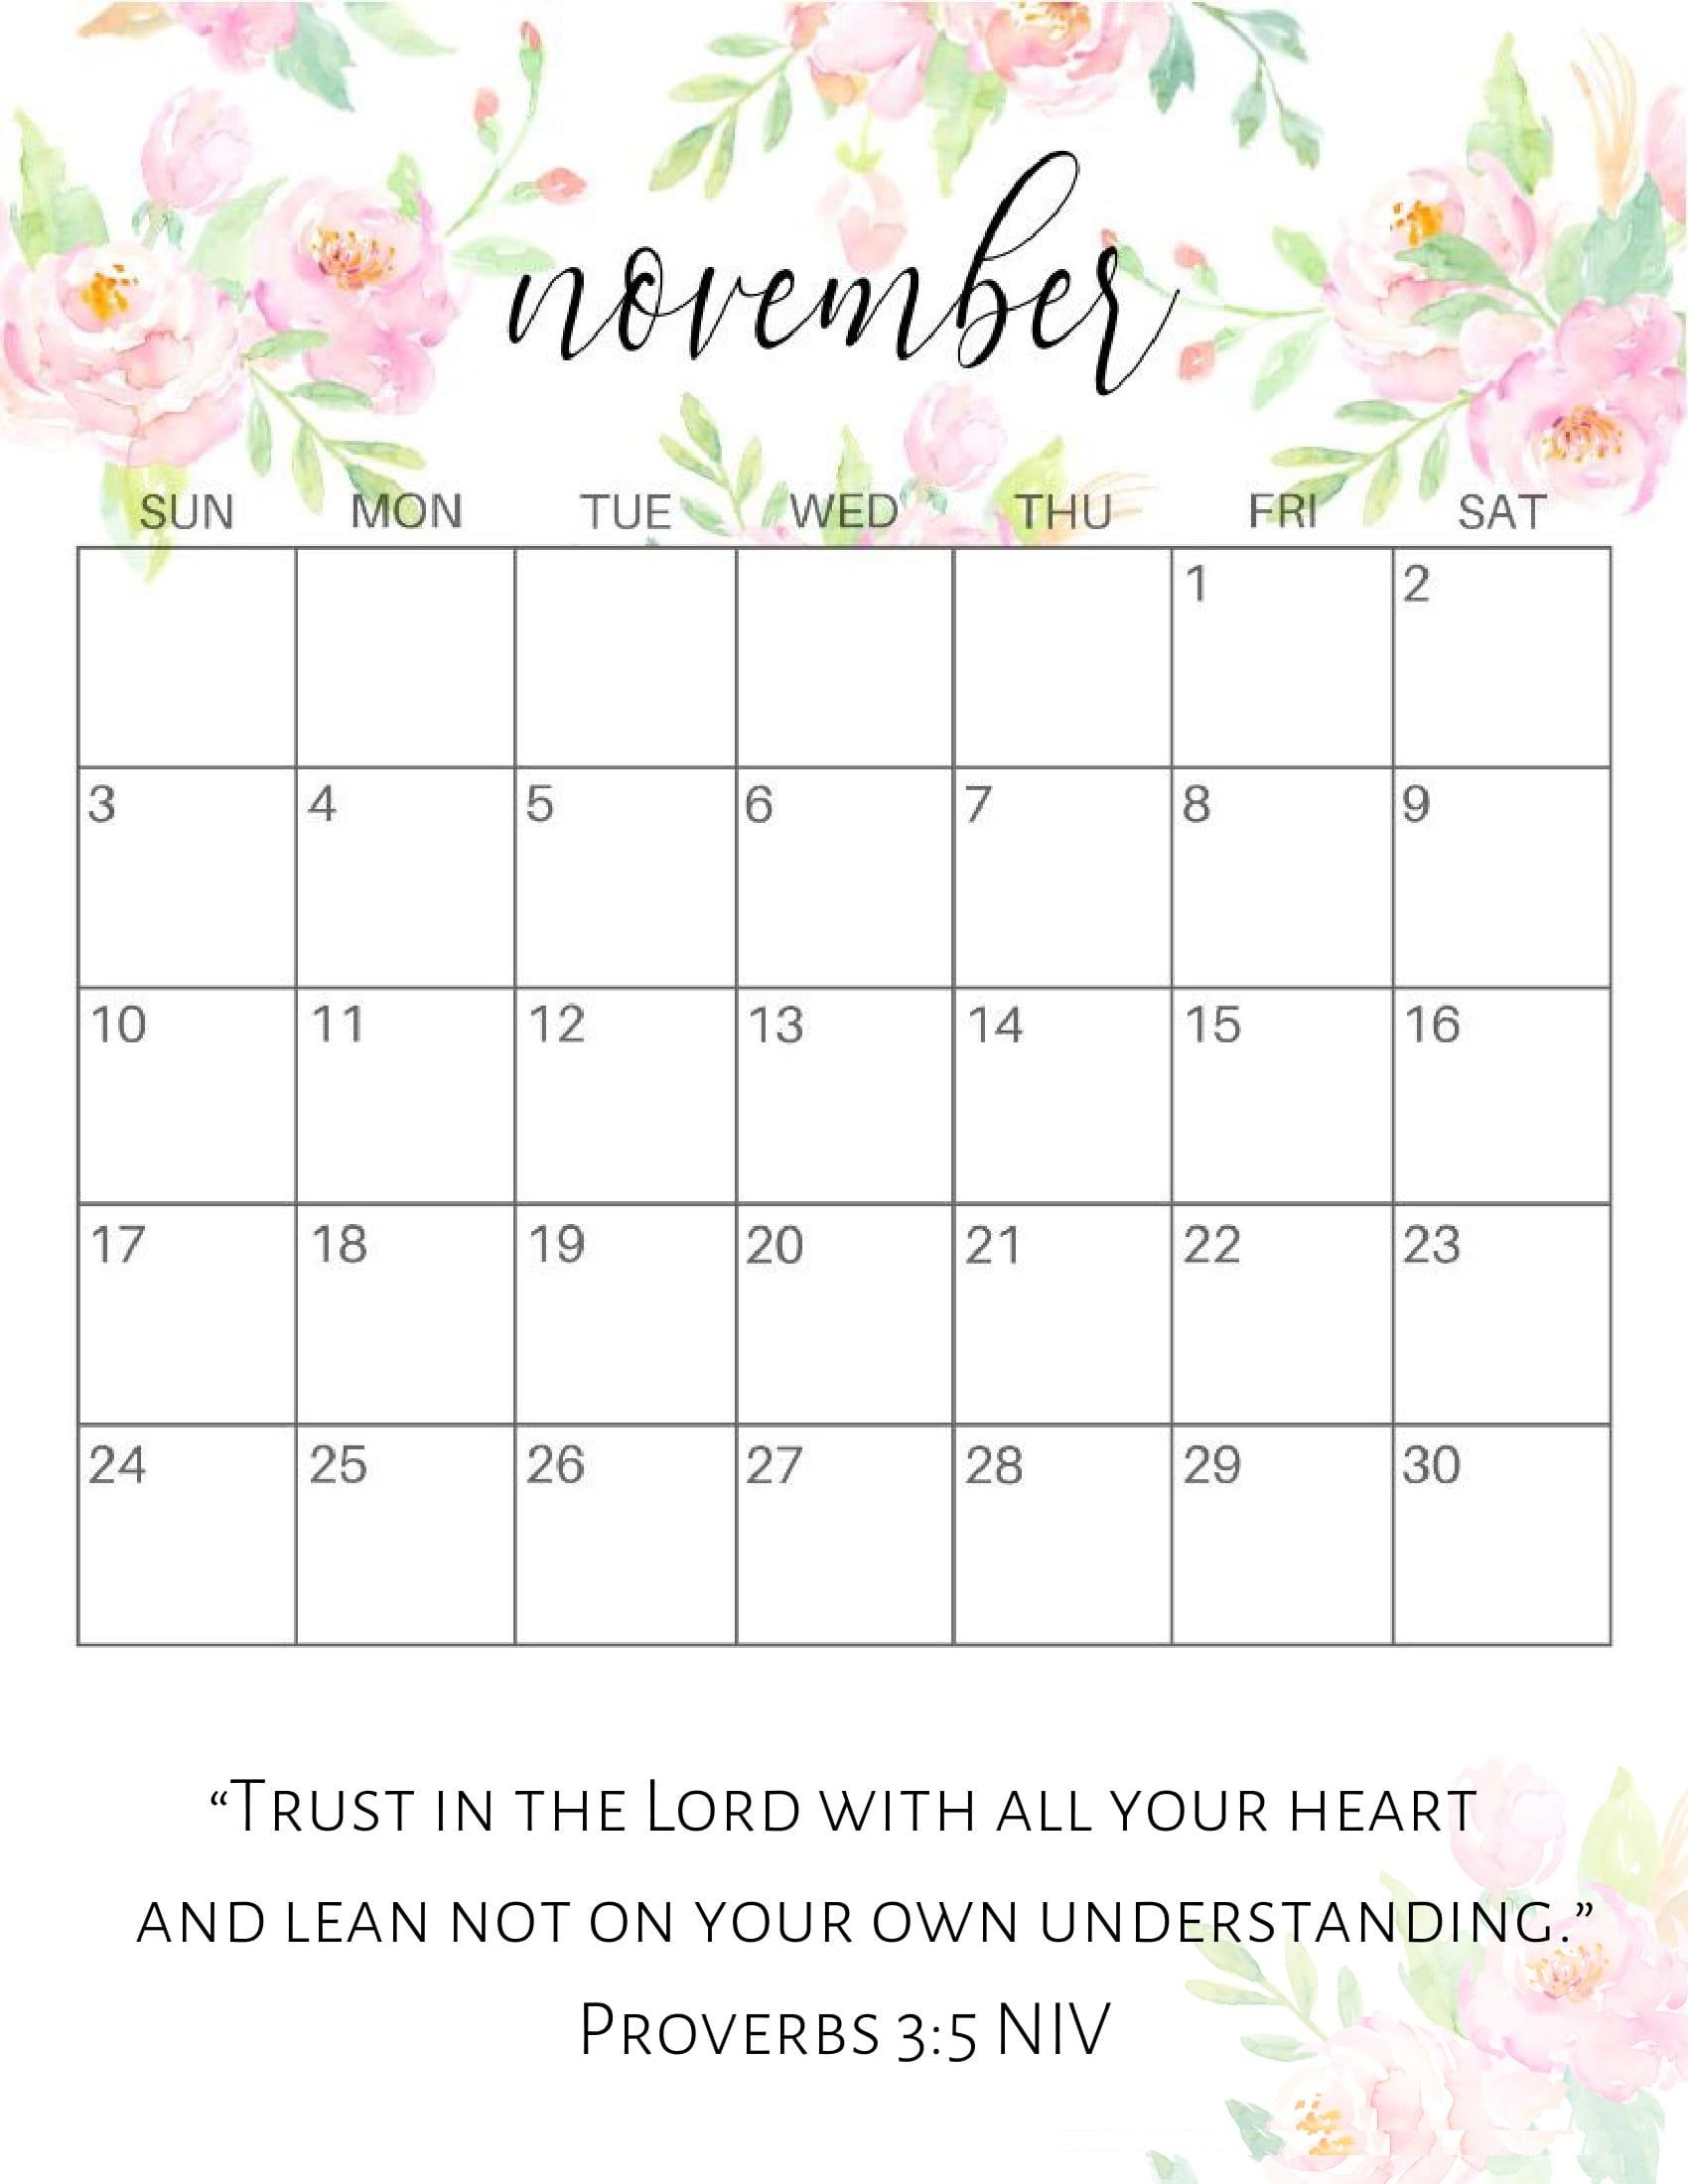 Cute November 2019 Calendar Printable Designs - 2019